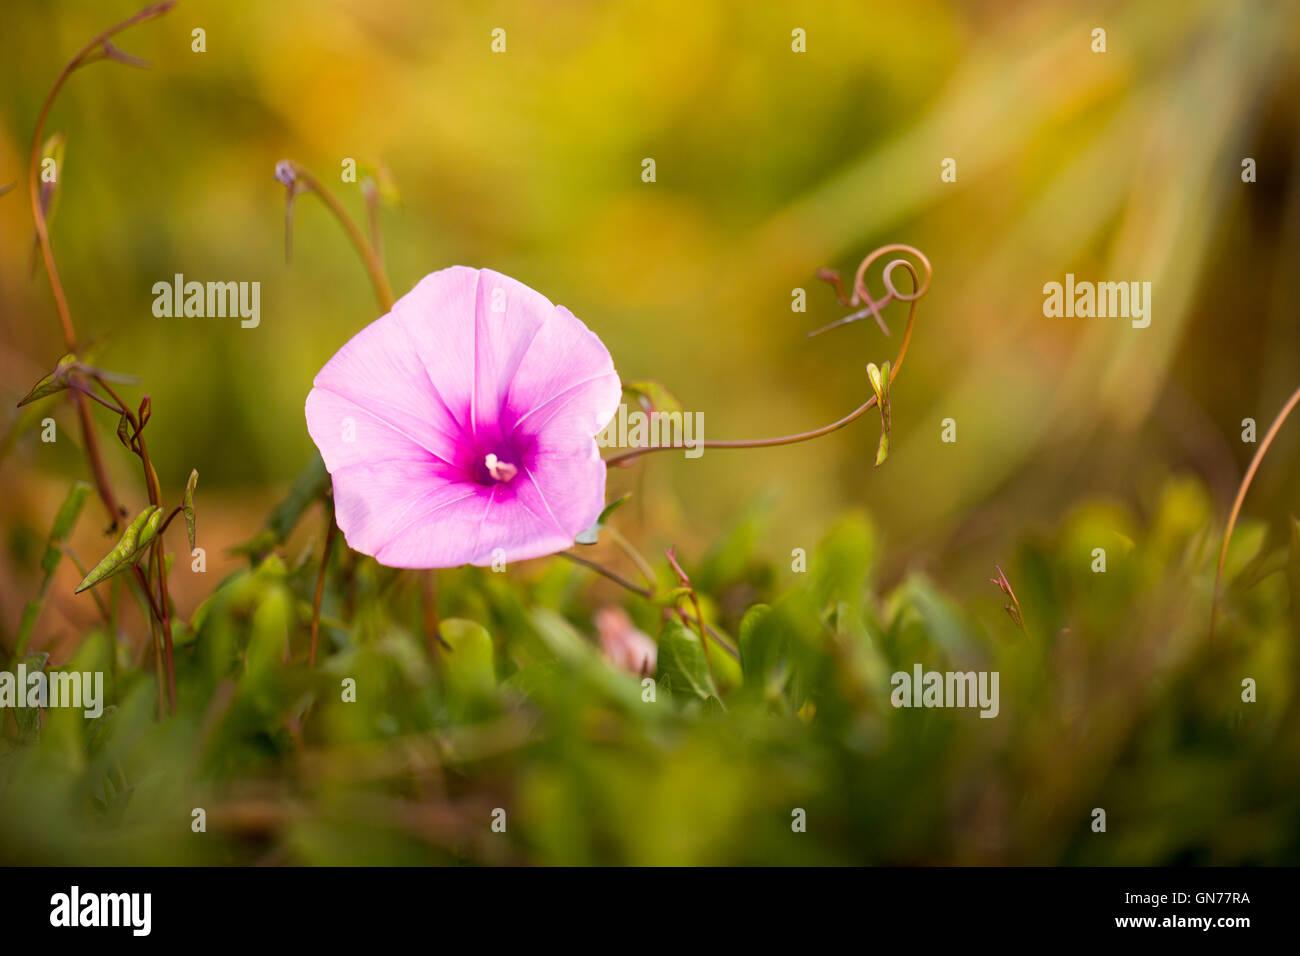 Saltmarsh morning glory flower (Ipomoea sagittata). This climbing plant inhabits coastal regions around the Eastern - Stock Image